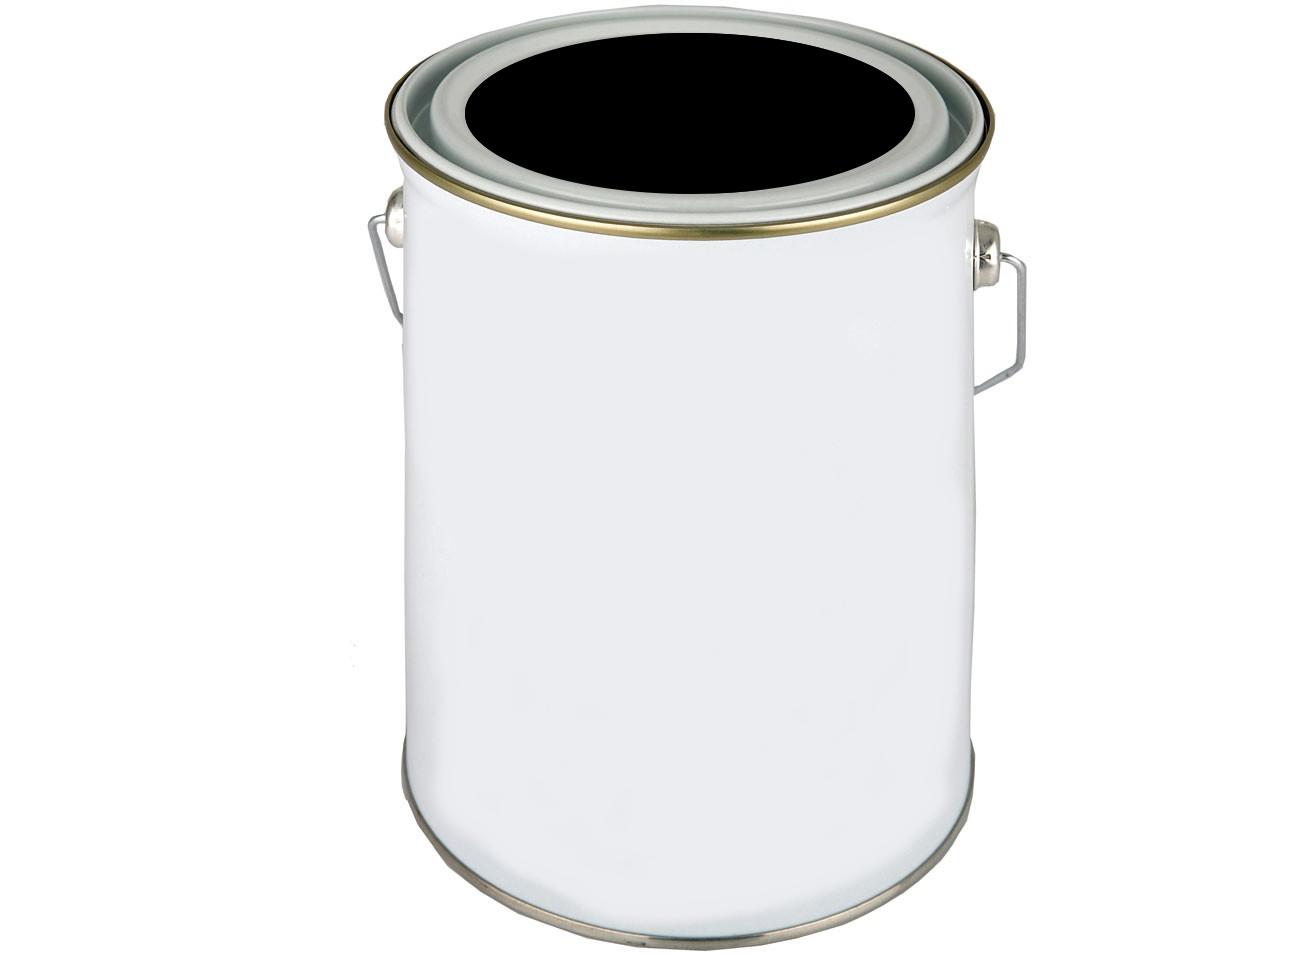 Bote de pintura rationalize - Blanco y negro paint ...